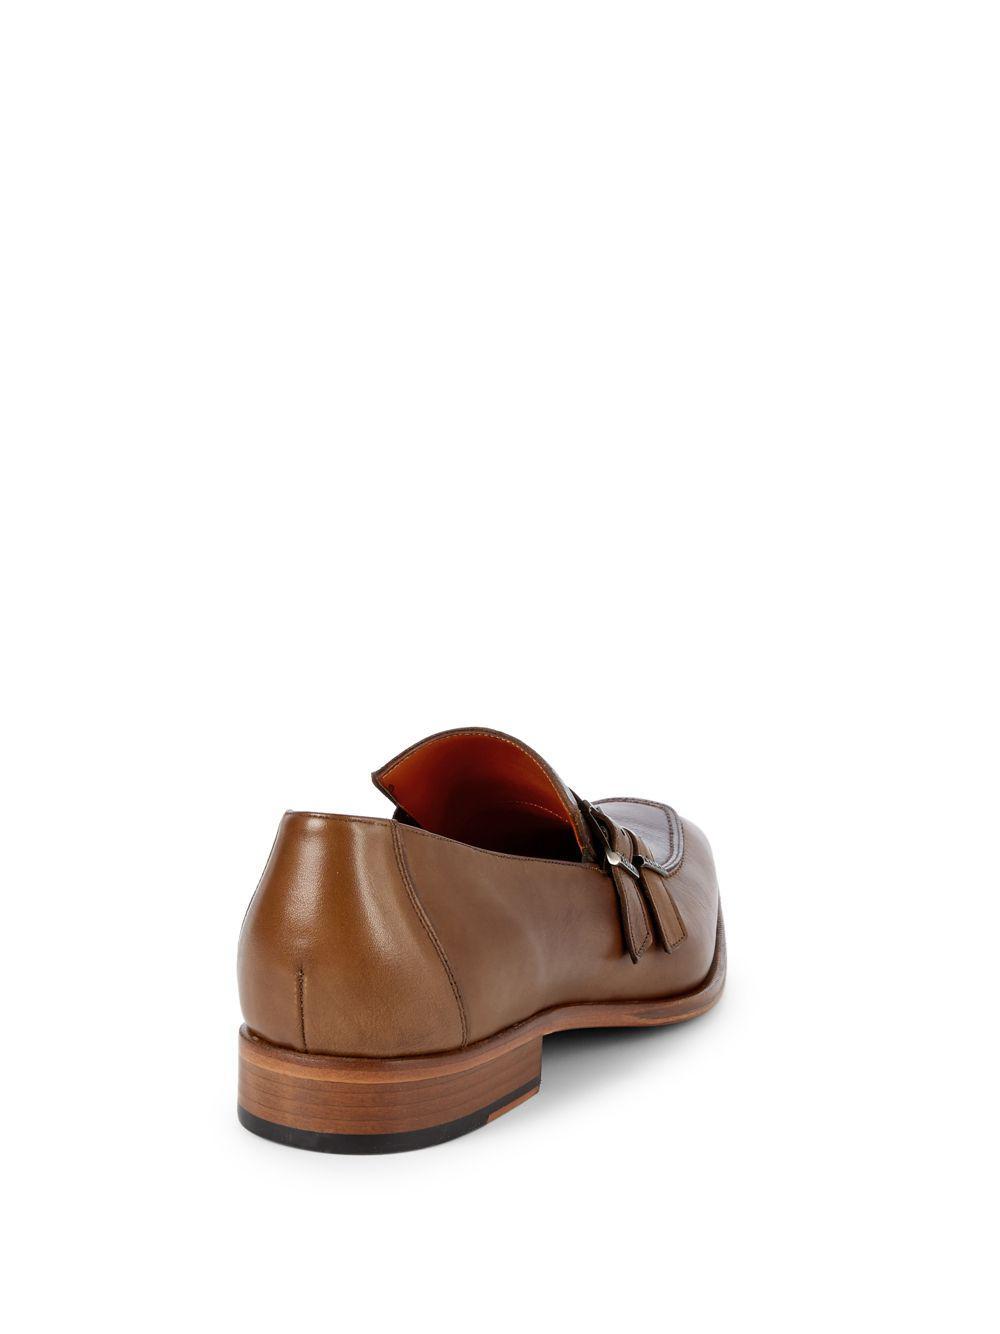 b9c81651759 Mezlan - Brown Leather Monk Strap Loafers for Men - Lyst. View fullscreen